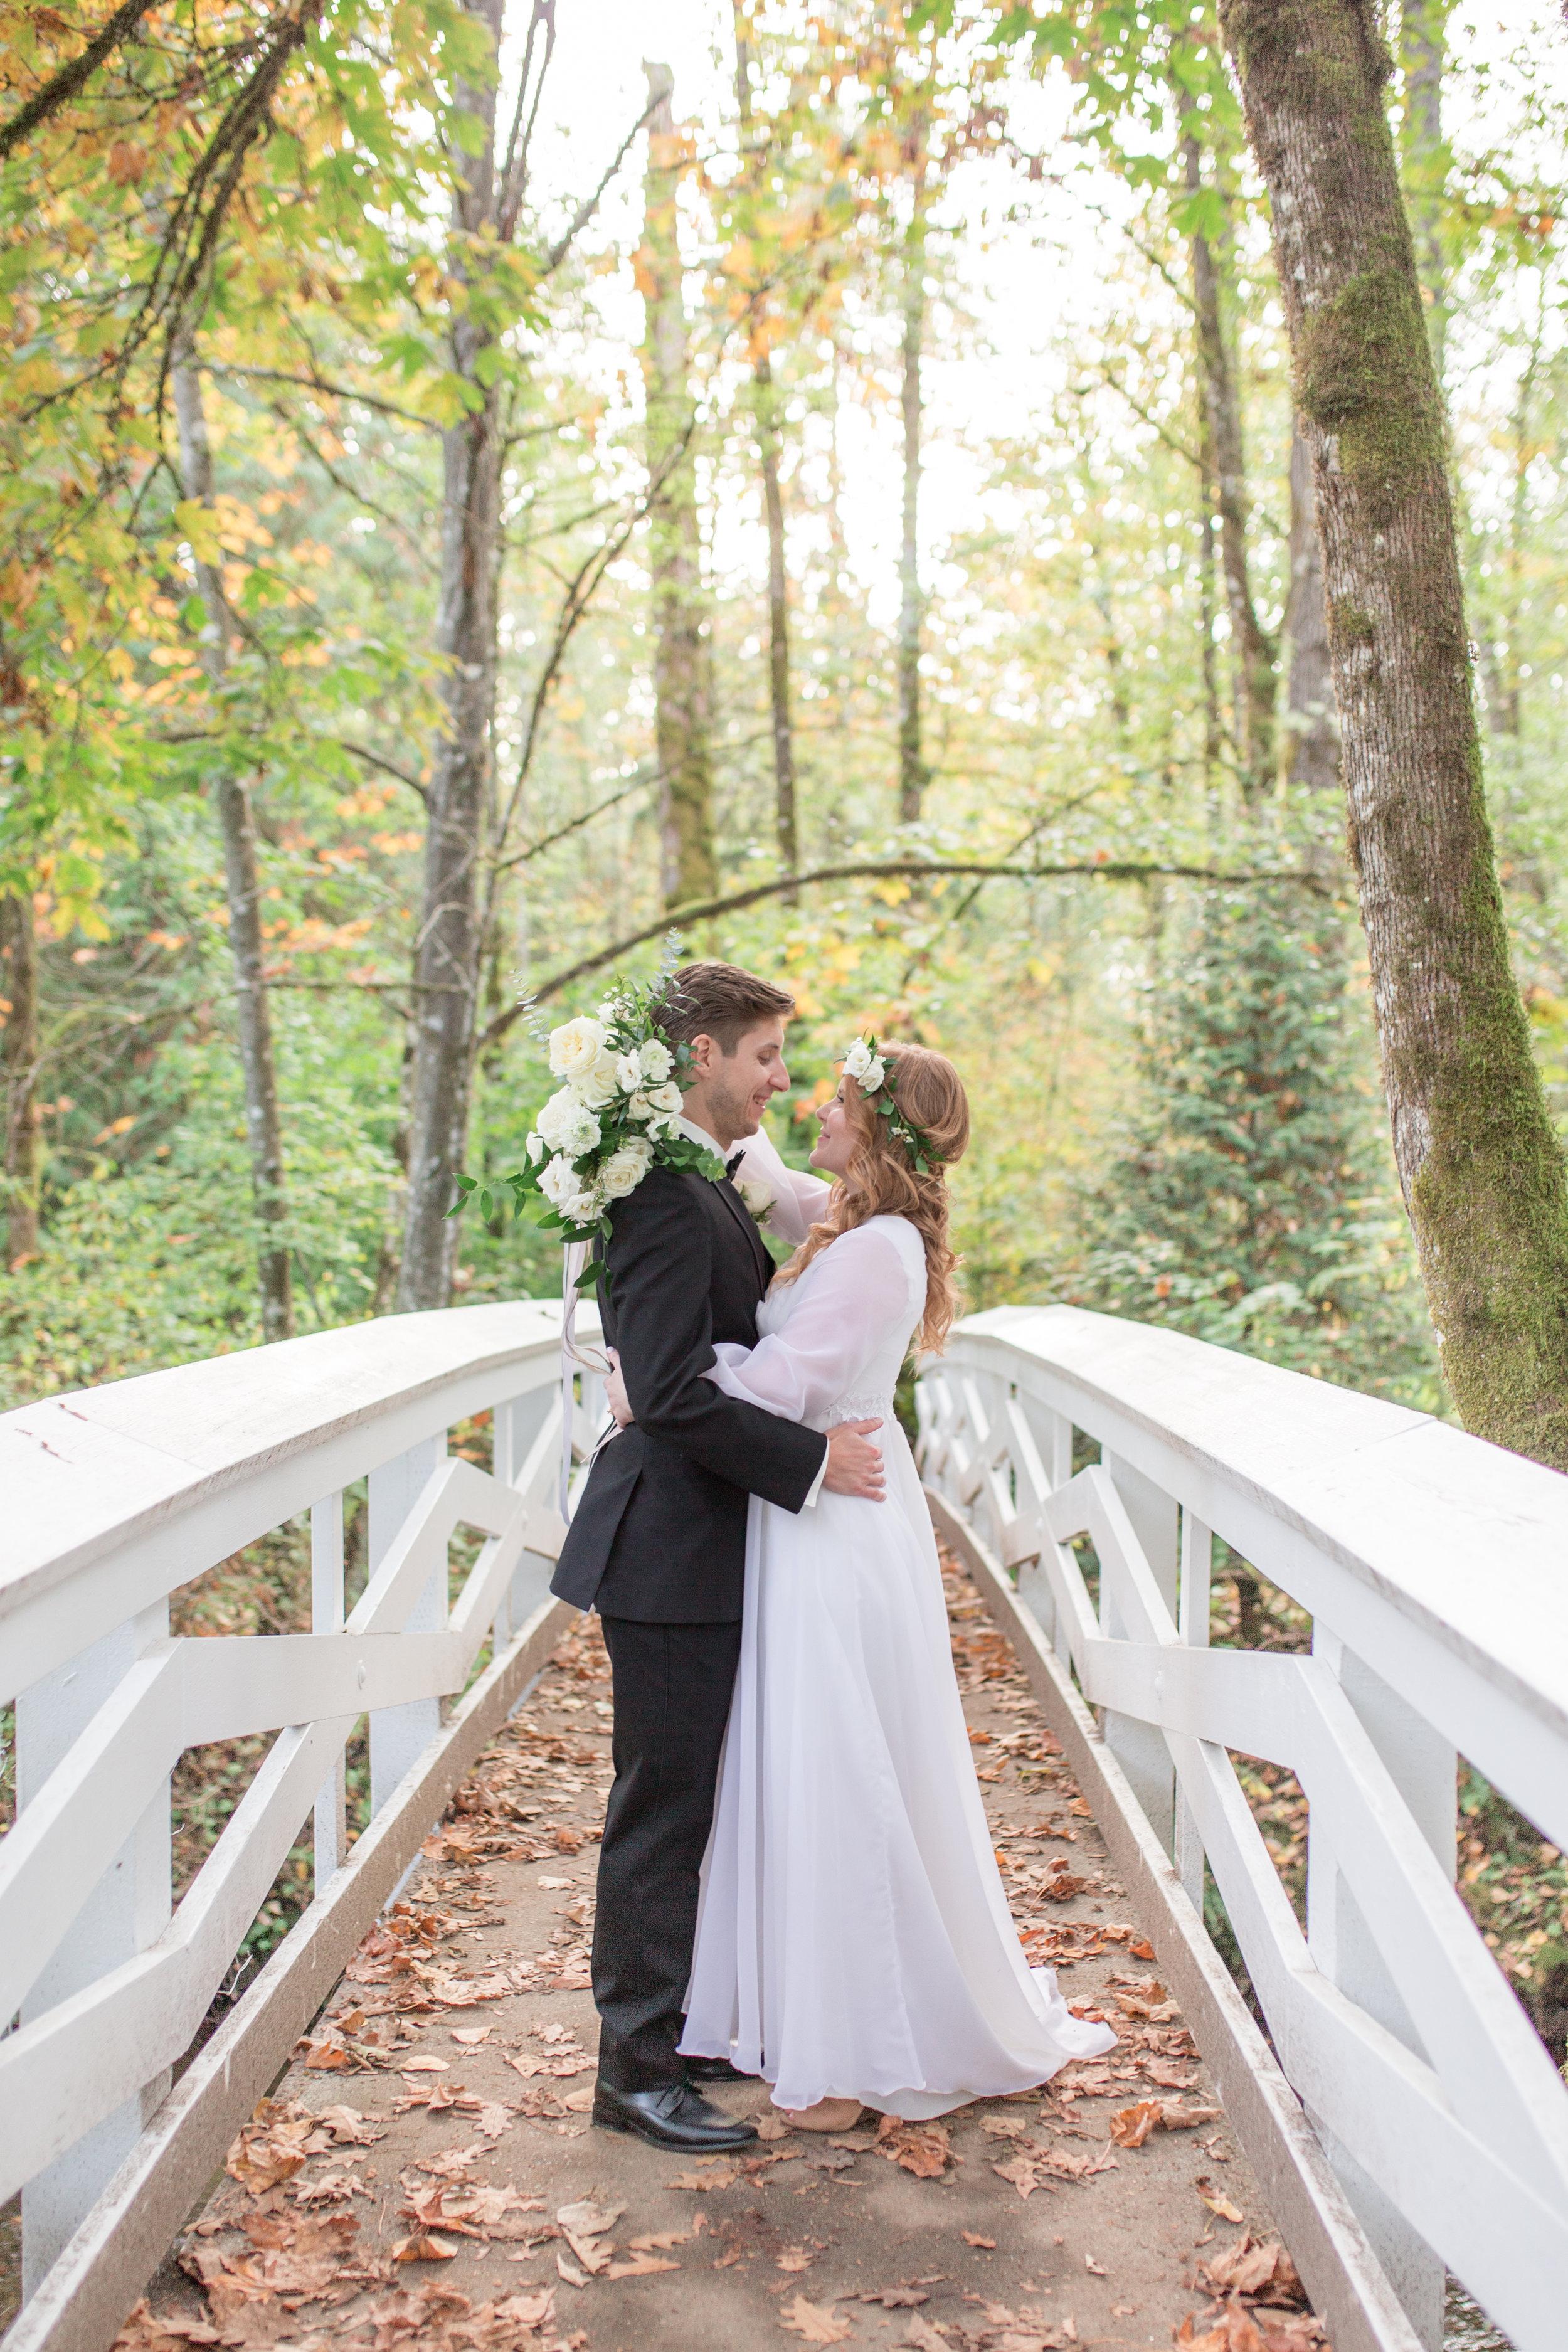 Kathleen + Tyler Wedding Photos-13.jpg